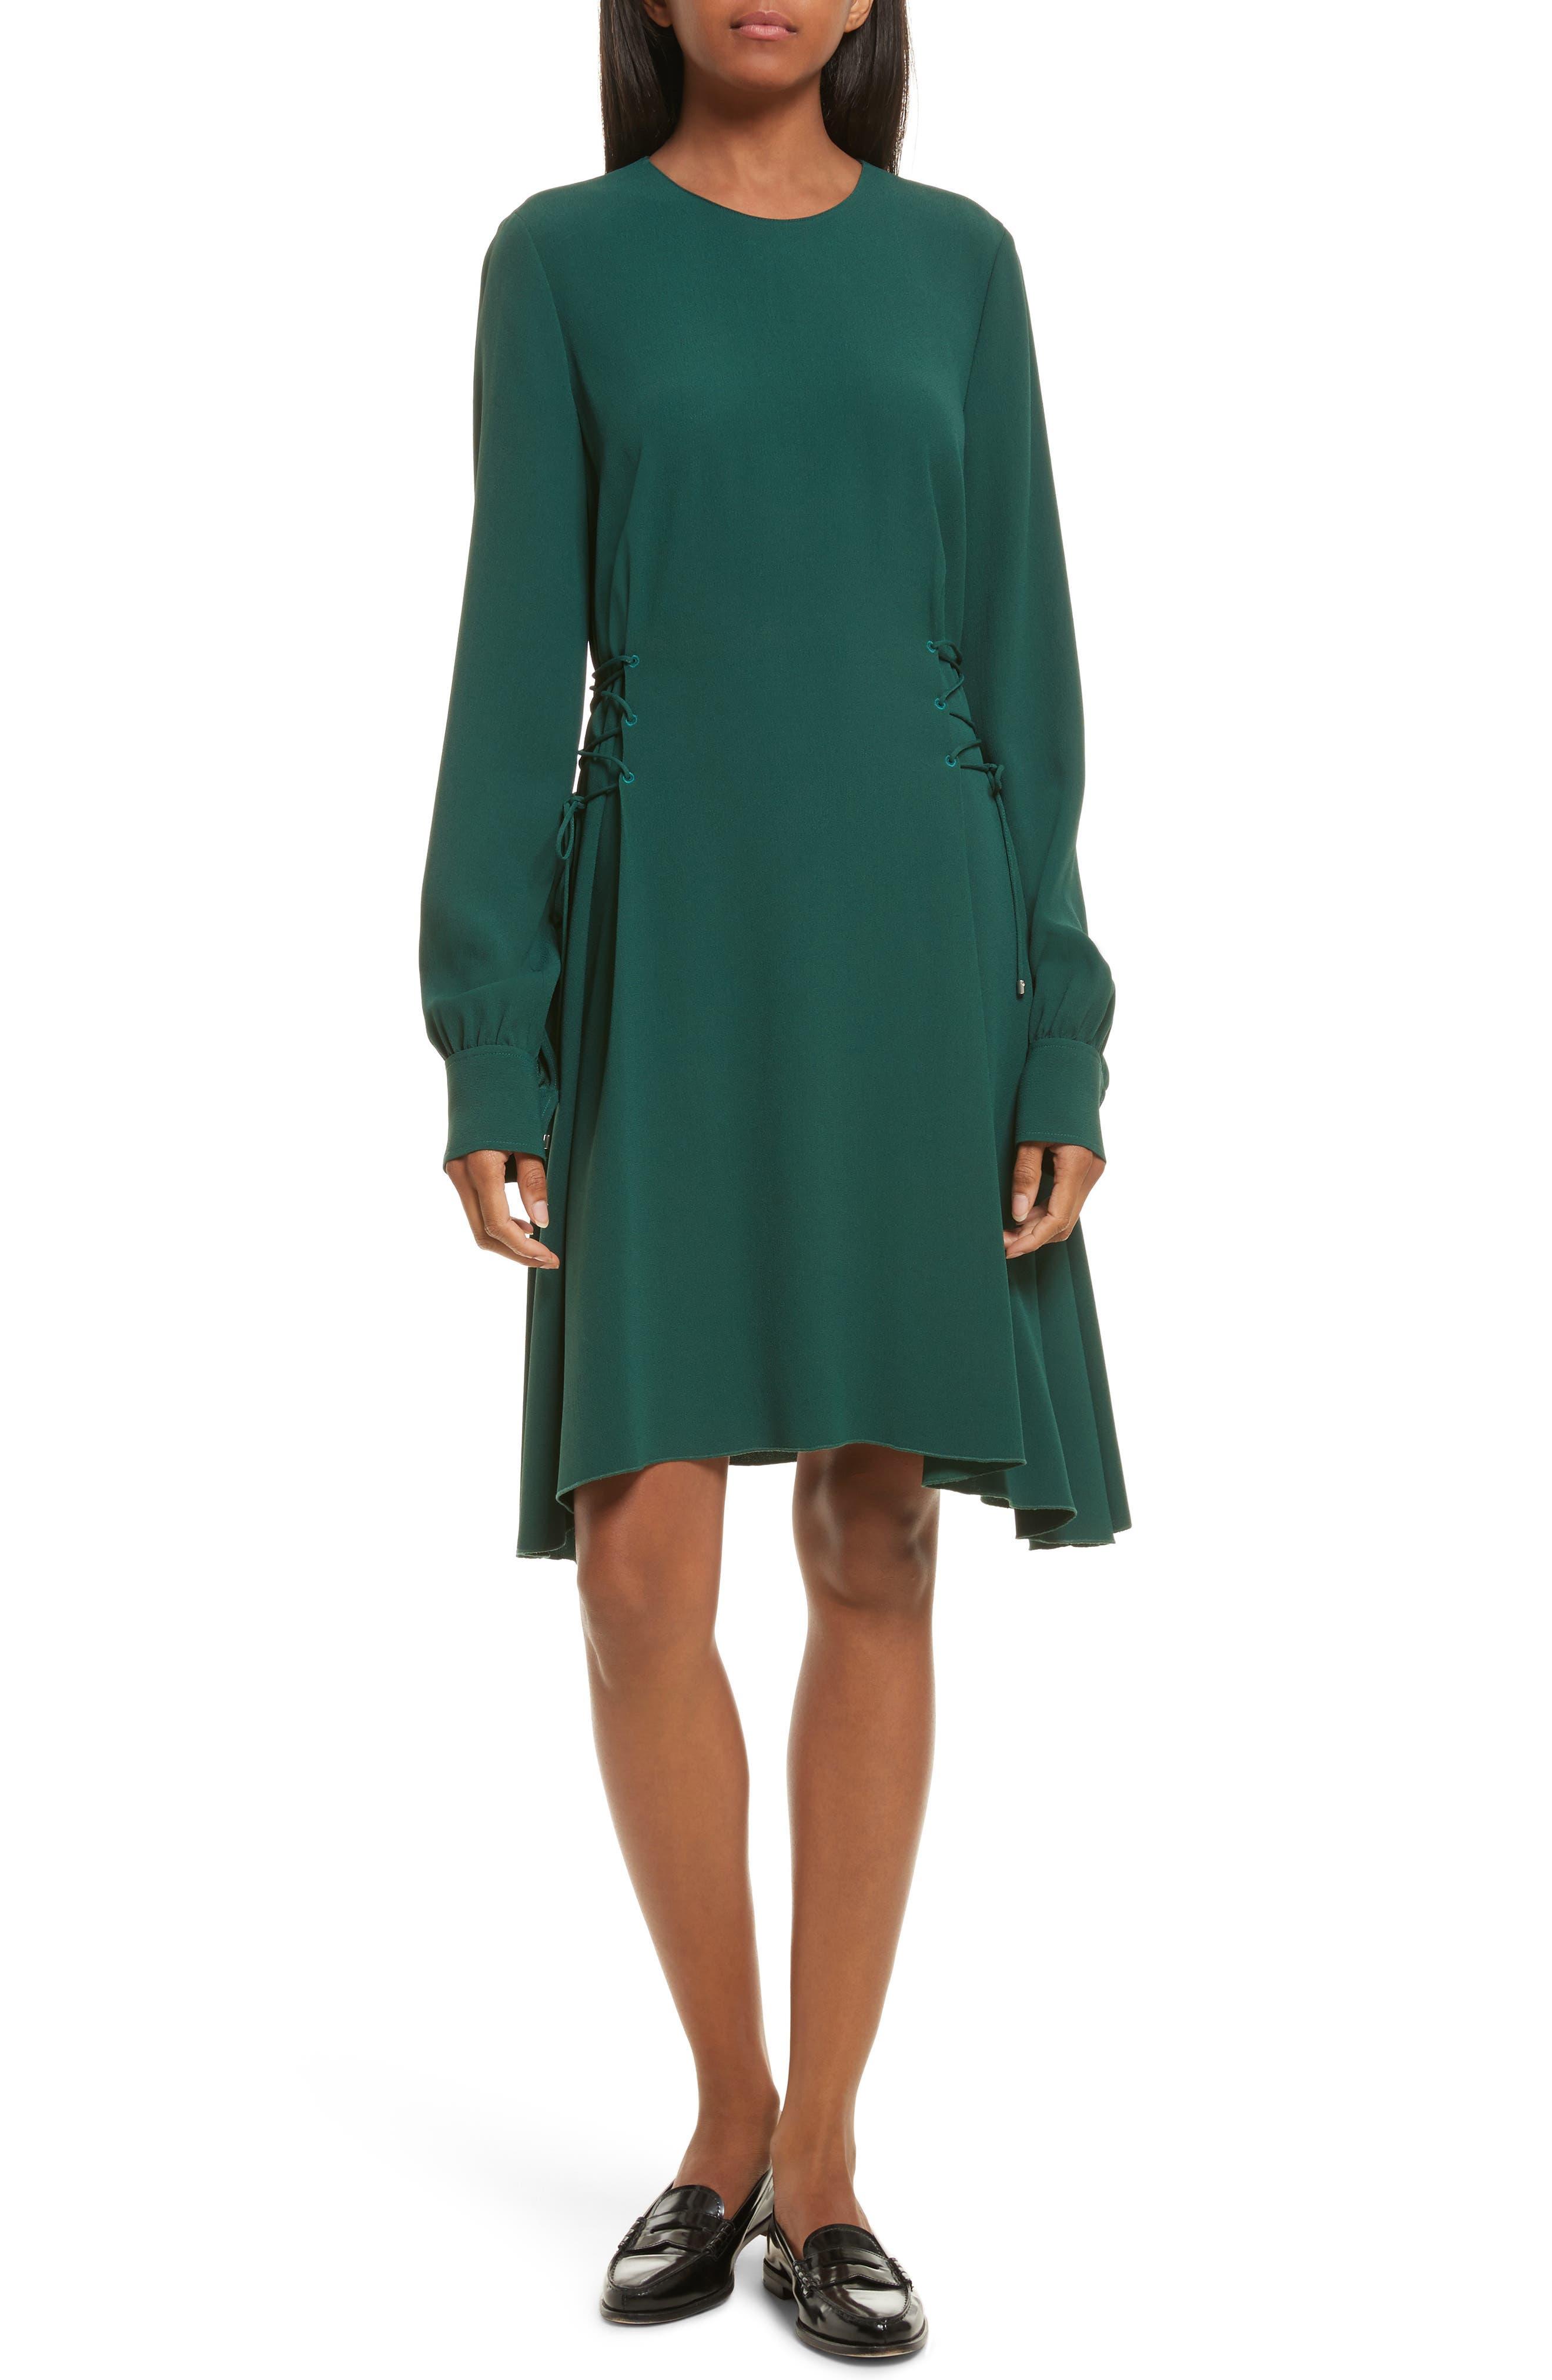 Kensington Lace-Up A-Line Dress,                             Main thumbnail 1, color,                             Bright Hunter